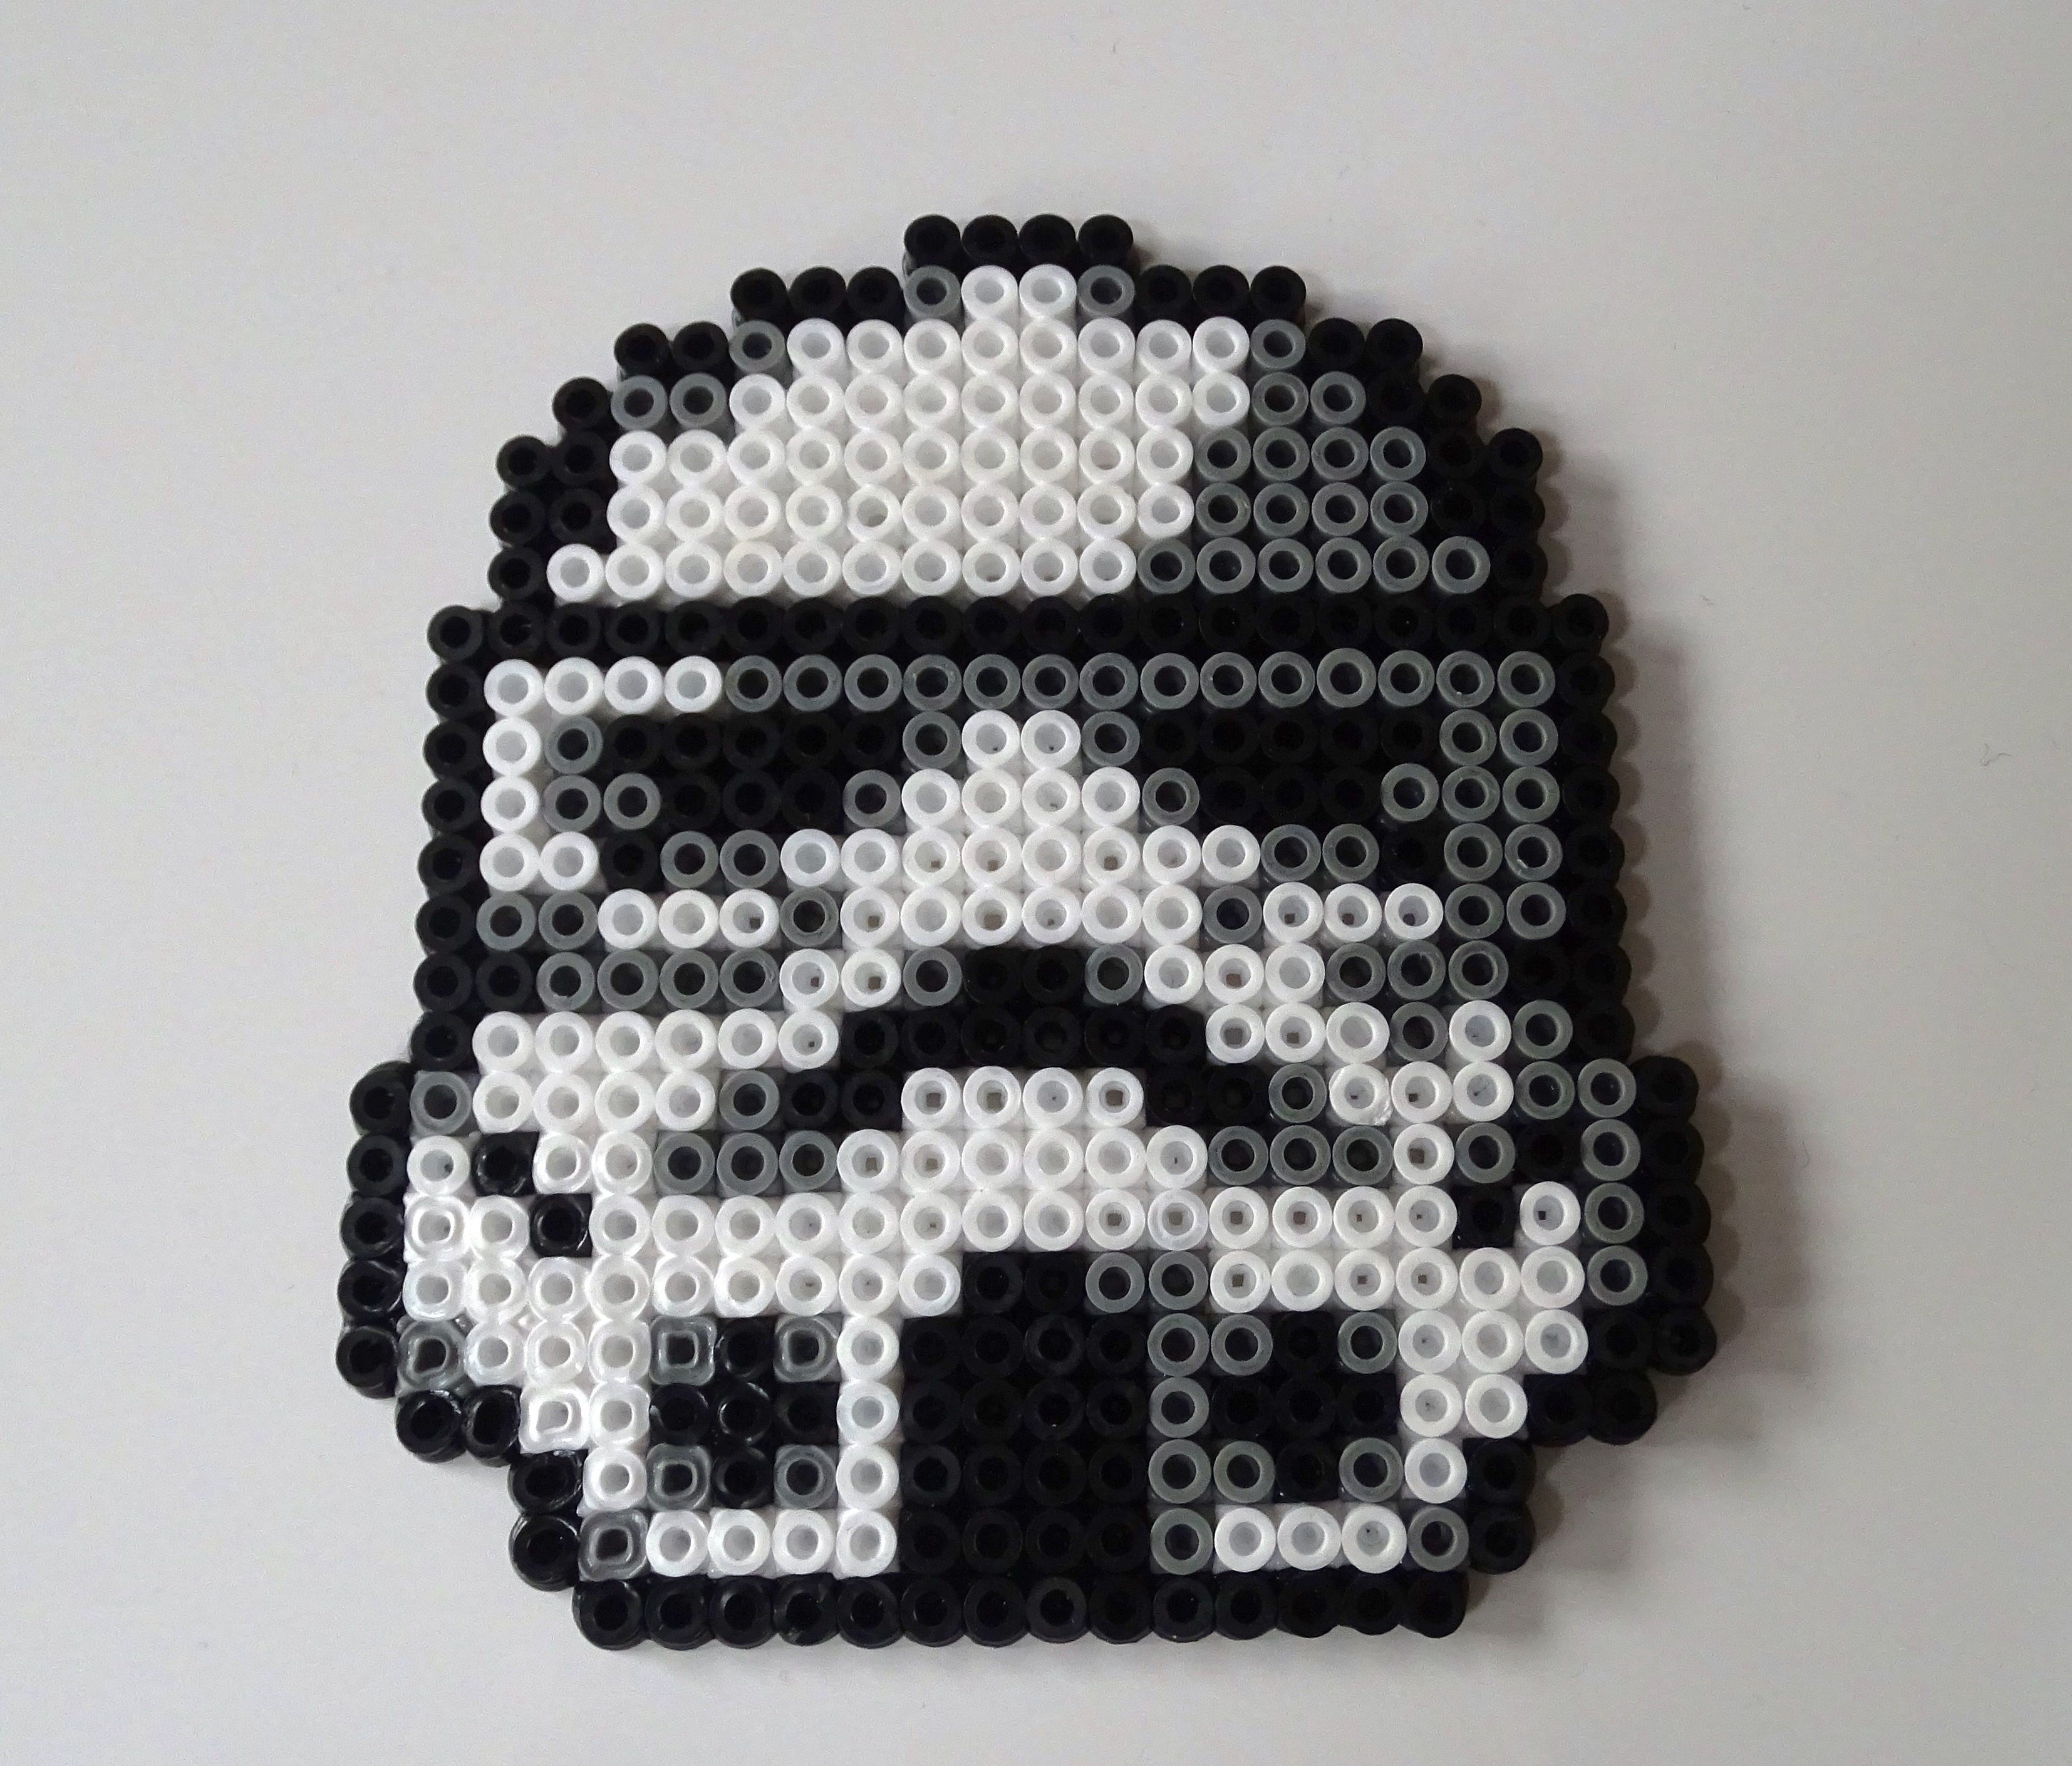 Darth Vader Clock Star Wars Hama Beads By Werner Herbener